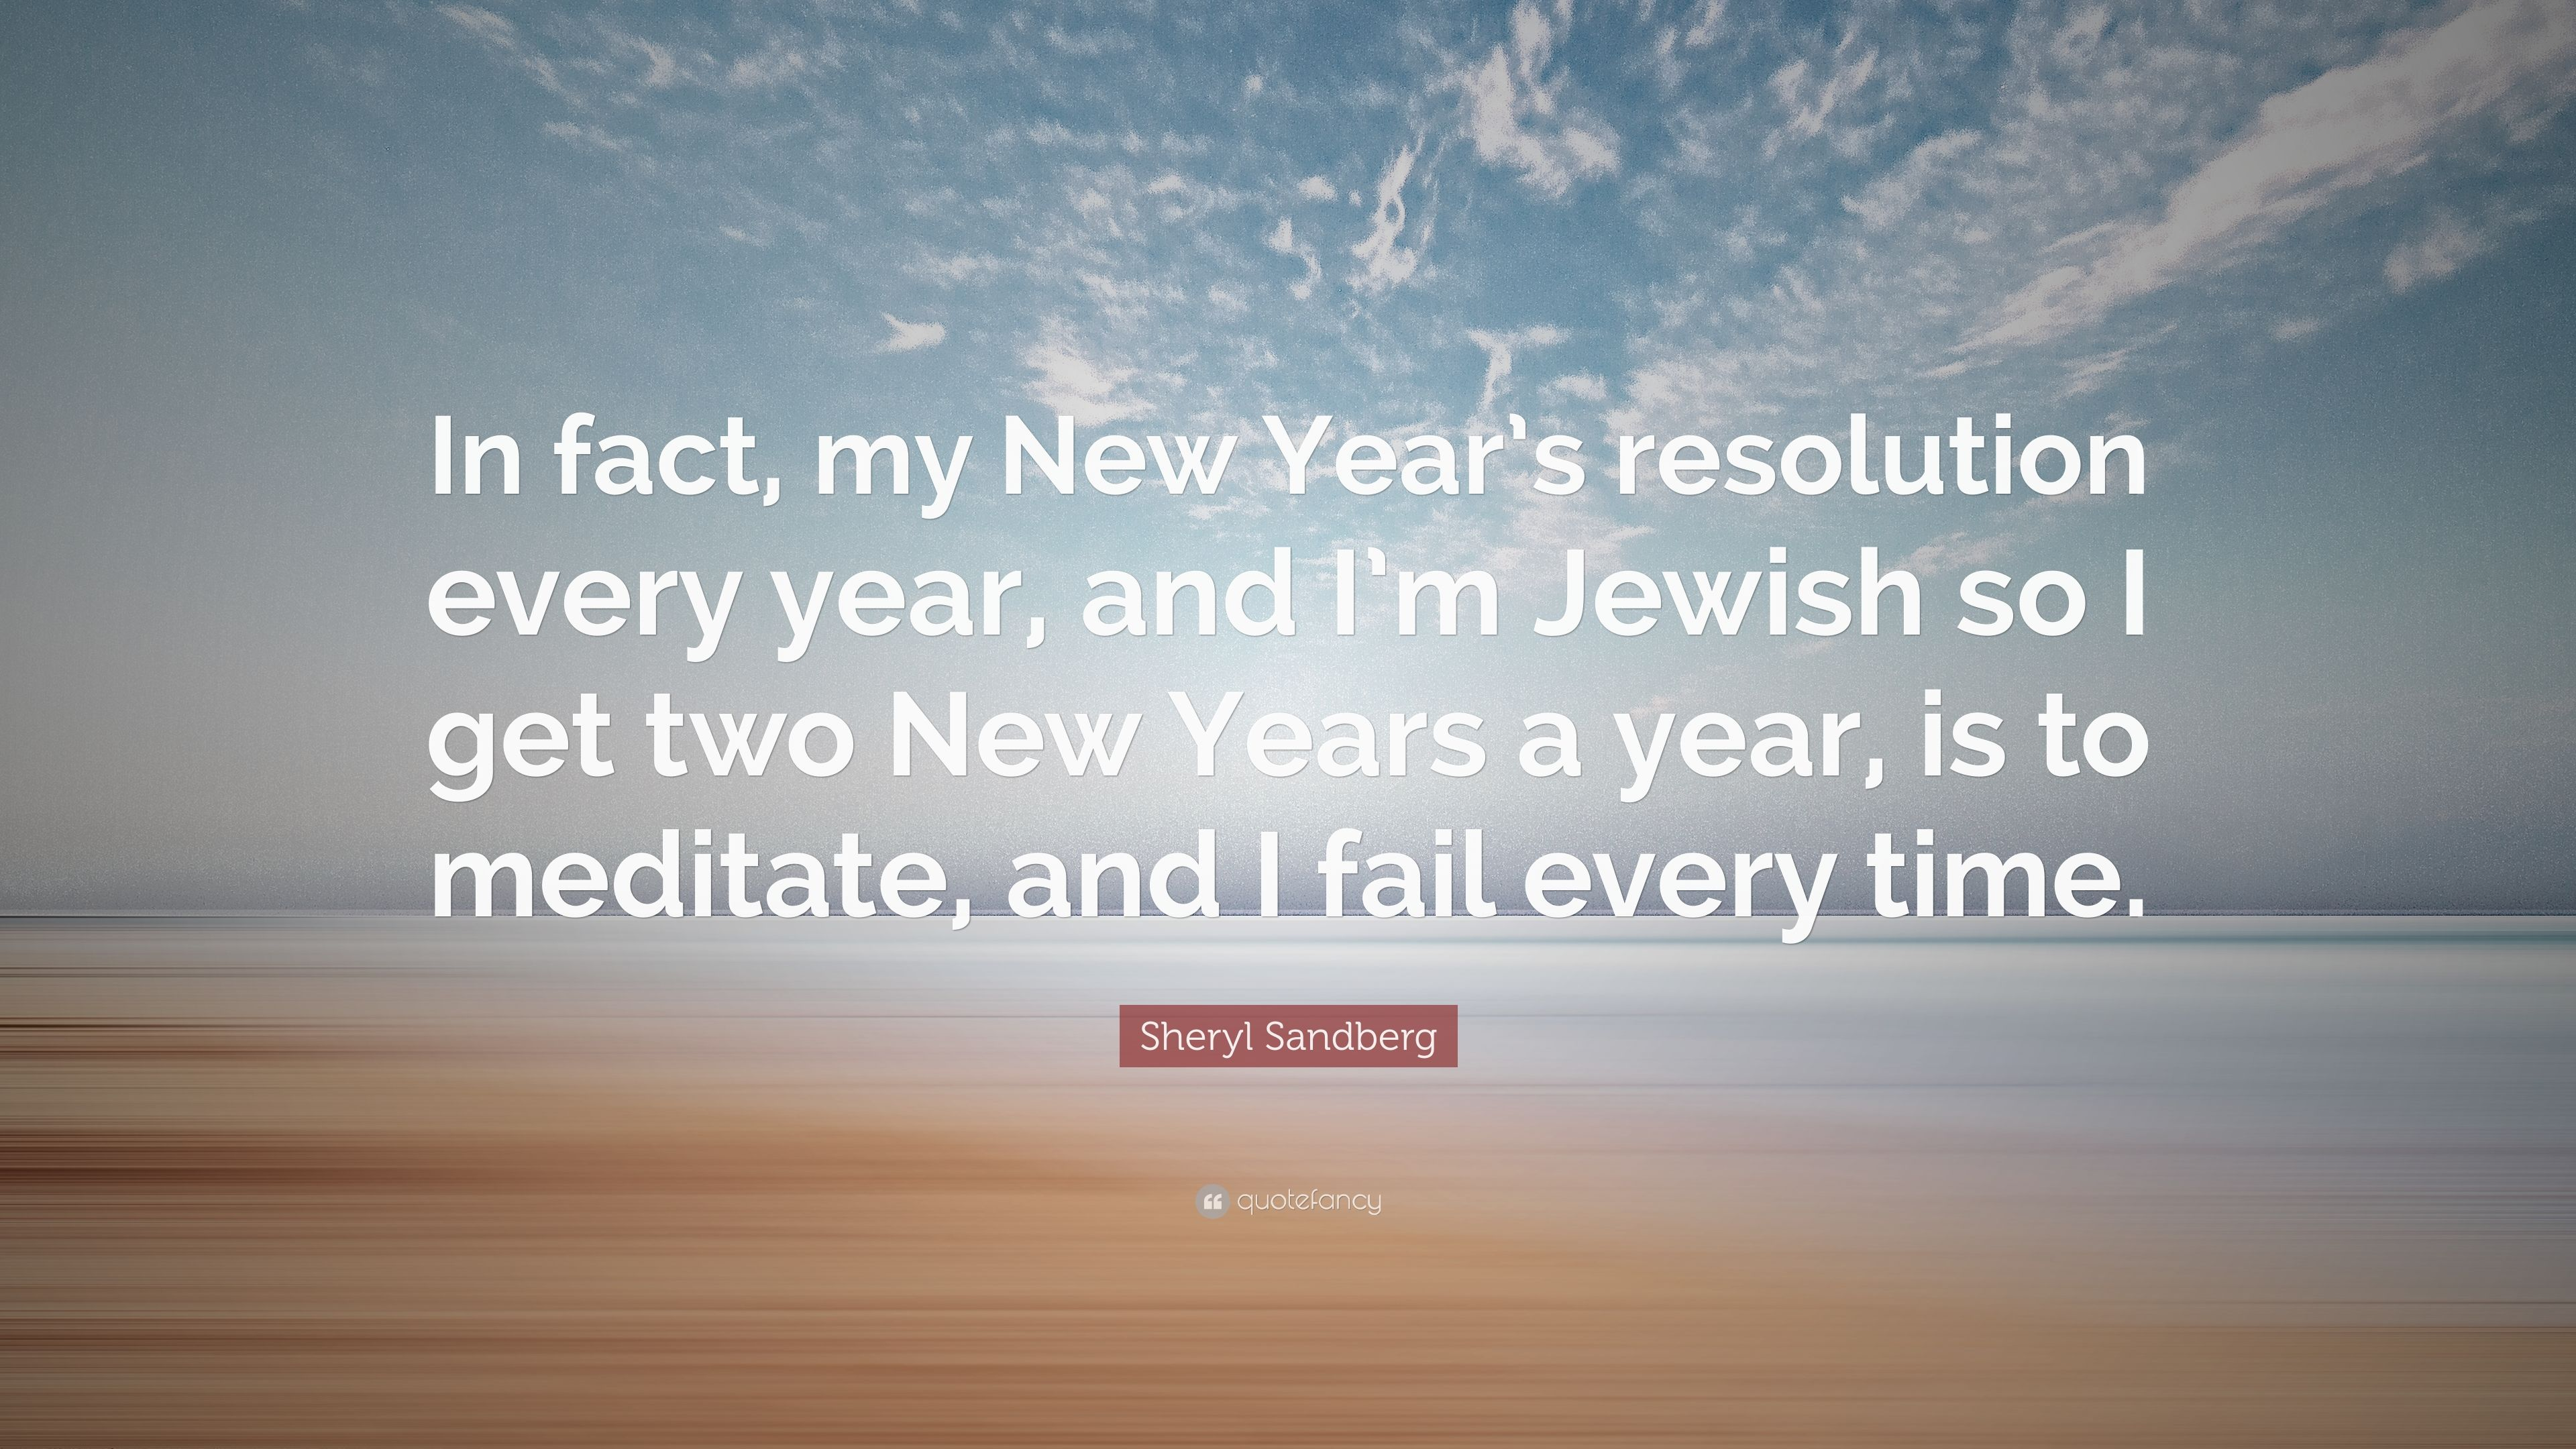 Sheryl Sandberg Quote: u201cIn fact, my New Yearu0027s resolution